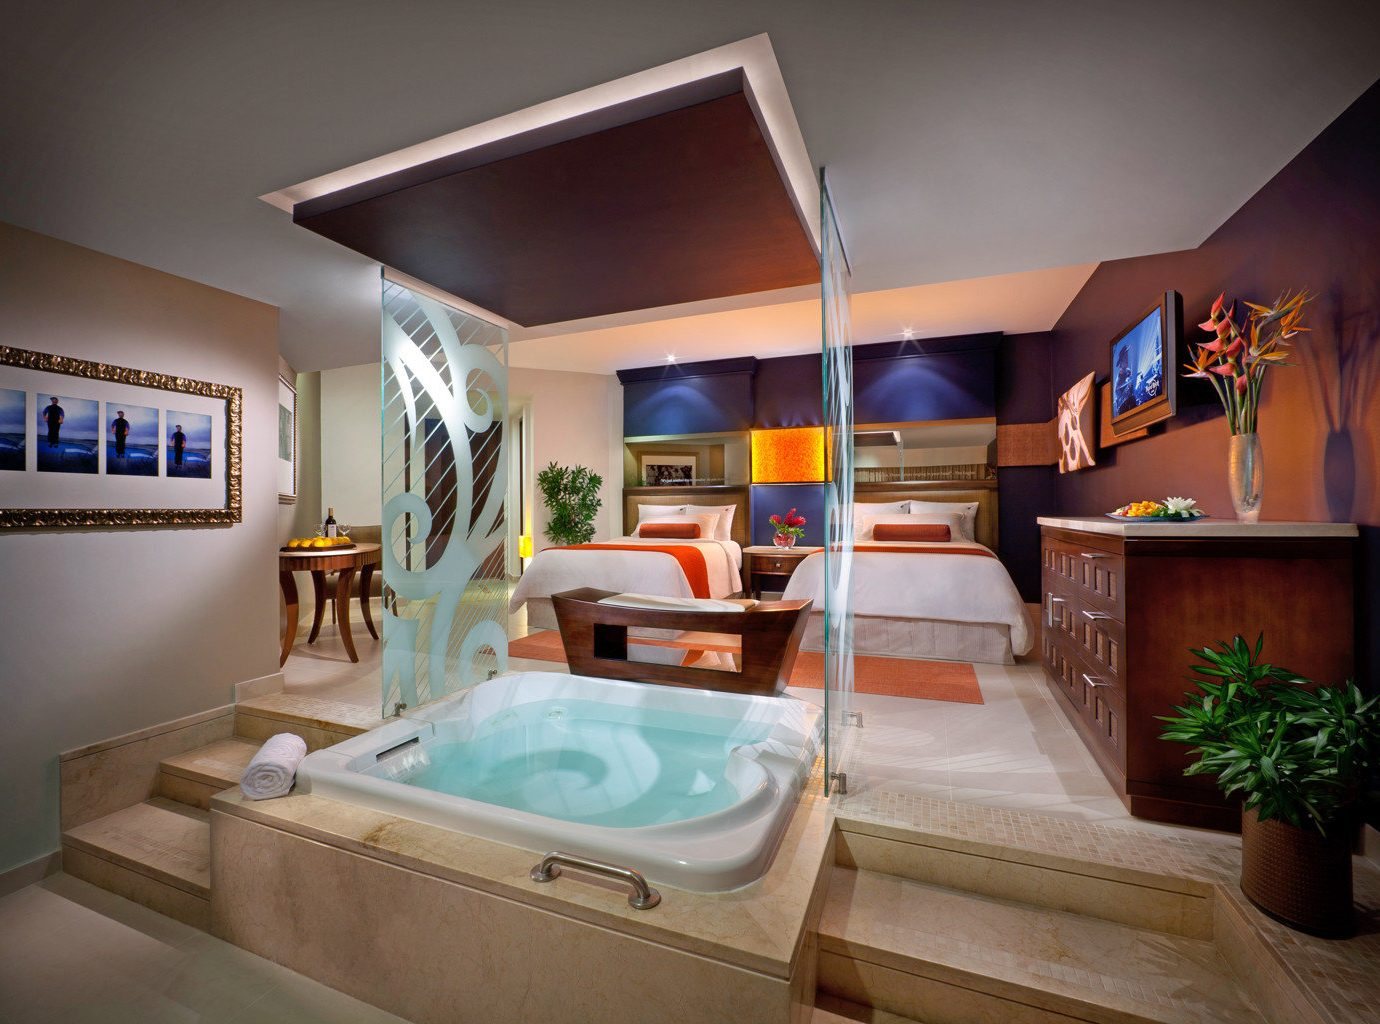 Bathroom with a hot tub at Hard Rock Hotel & Casino Punta Cana, Dominican Republic